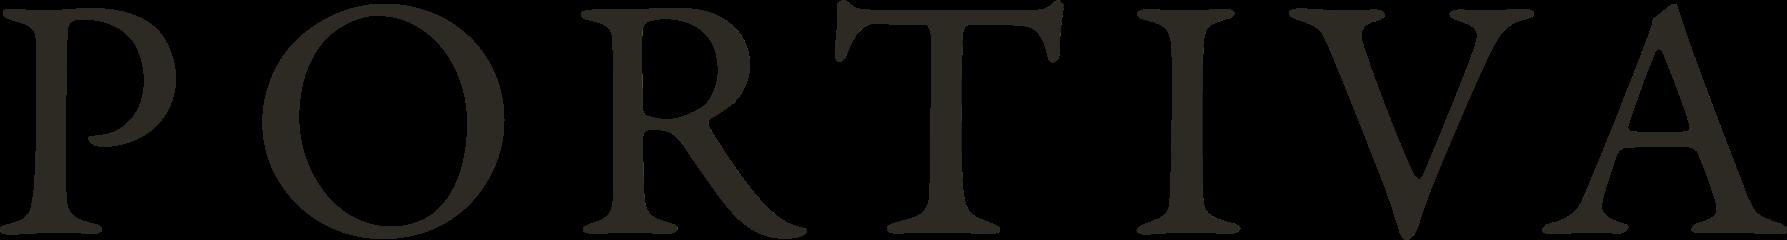 Jacksonville Property Logo 17